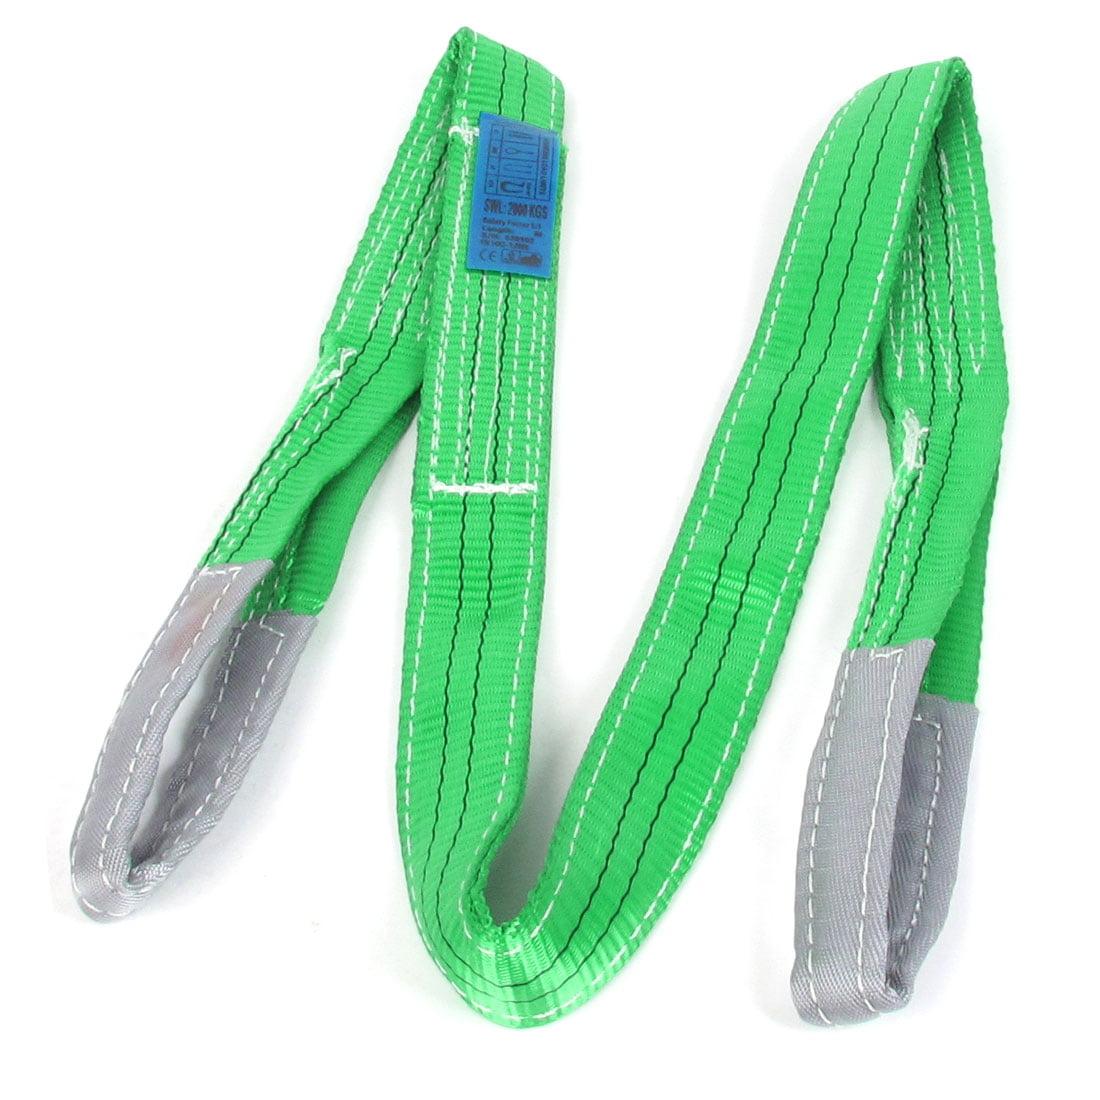 2M 6.6Ft 2 Ton Capacity Straight Eye to Eye Hoist Web Strap Green Gray